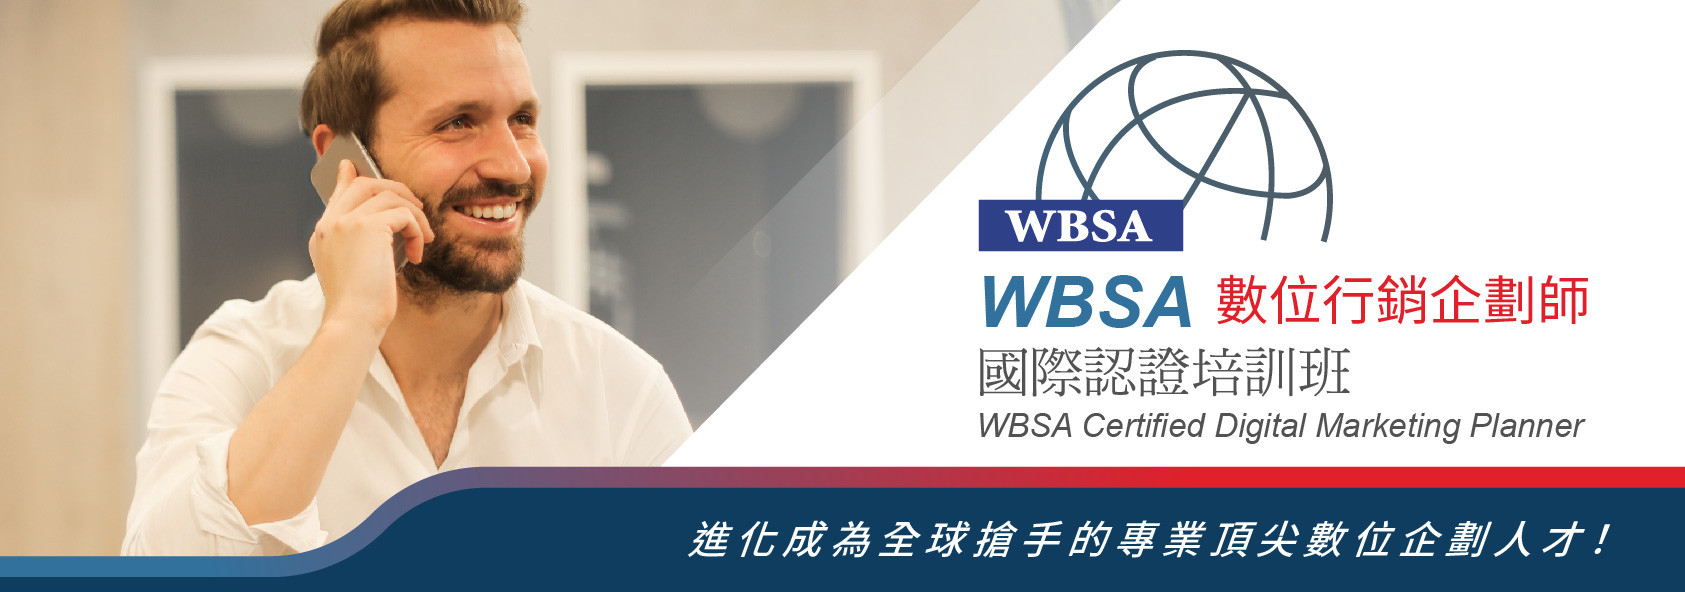 WBSA數位行銷企劃